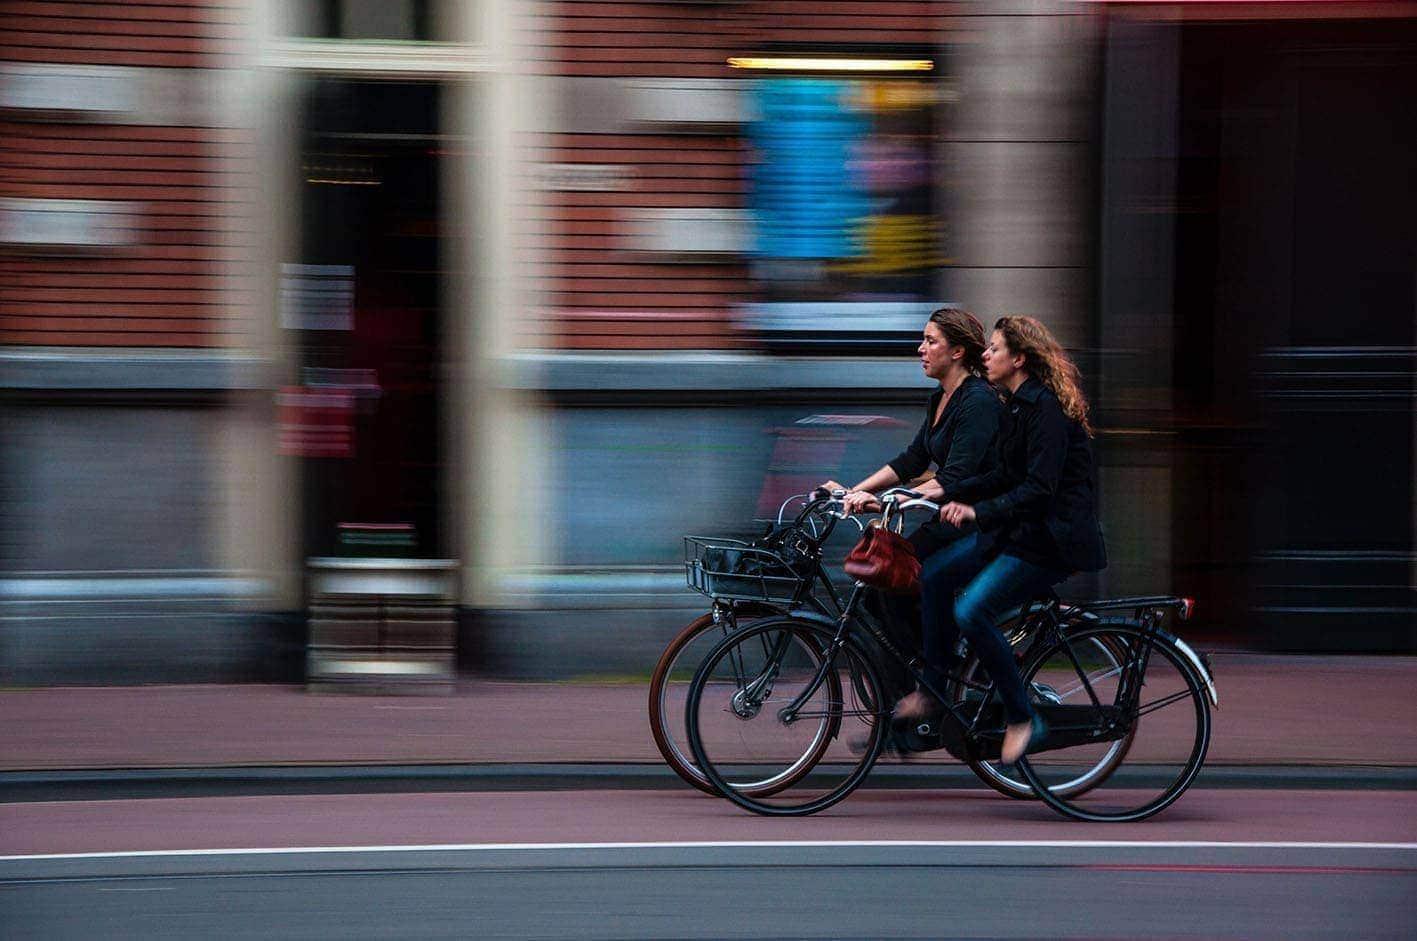 Imagen de dos mujeres montando en bicicleta